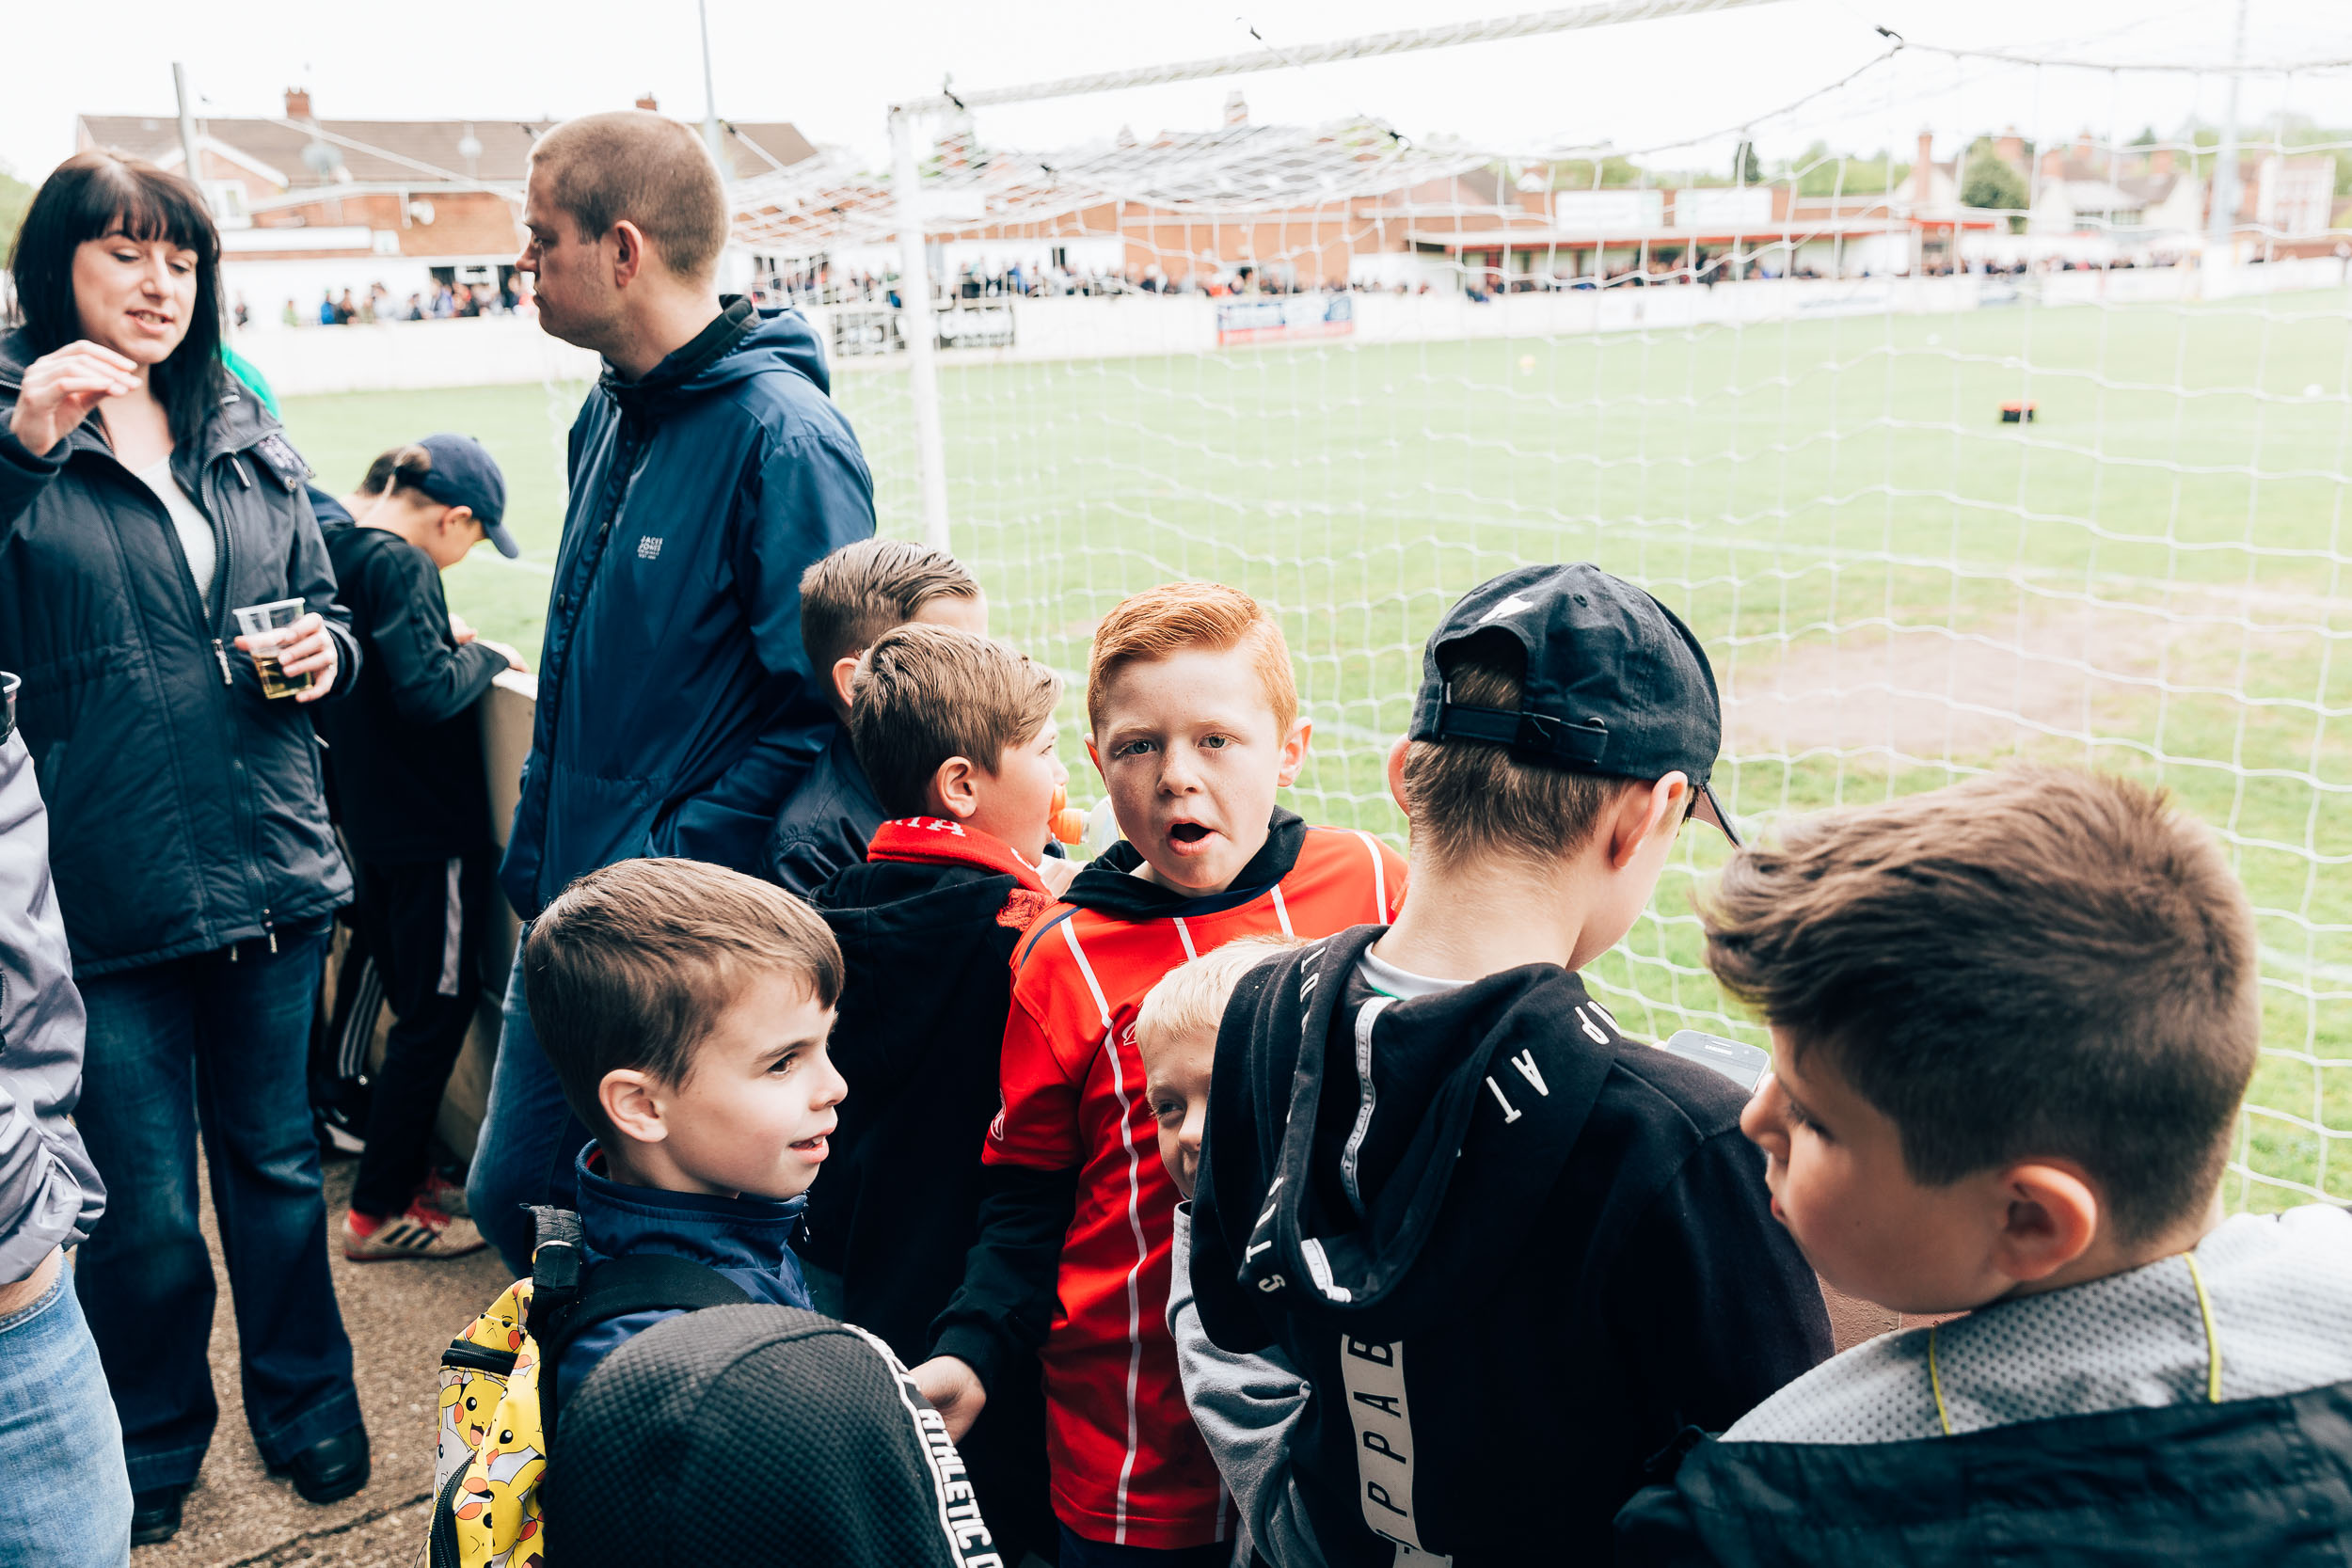 06_05_2019_Bromsgrove_Sporting_Corby-26.jpg